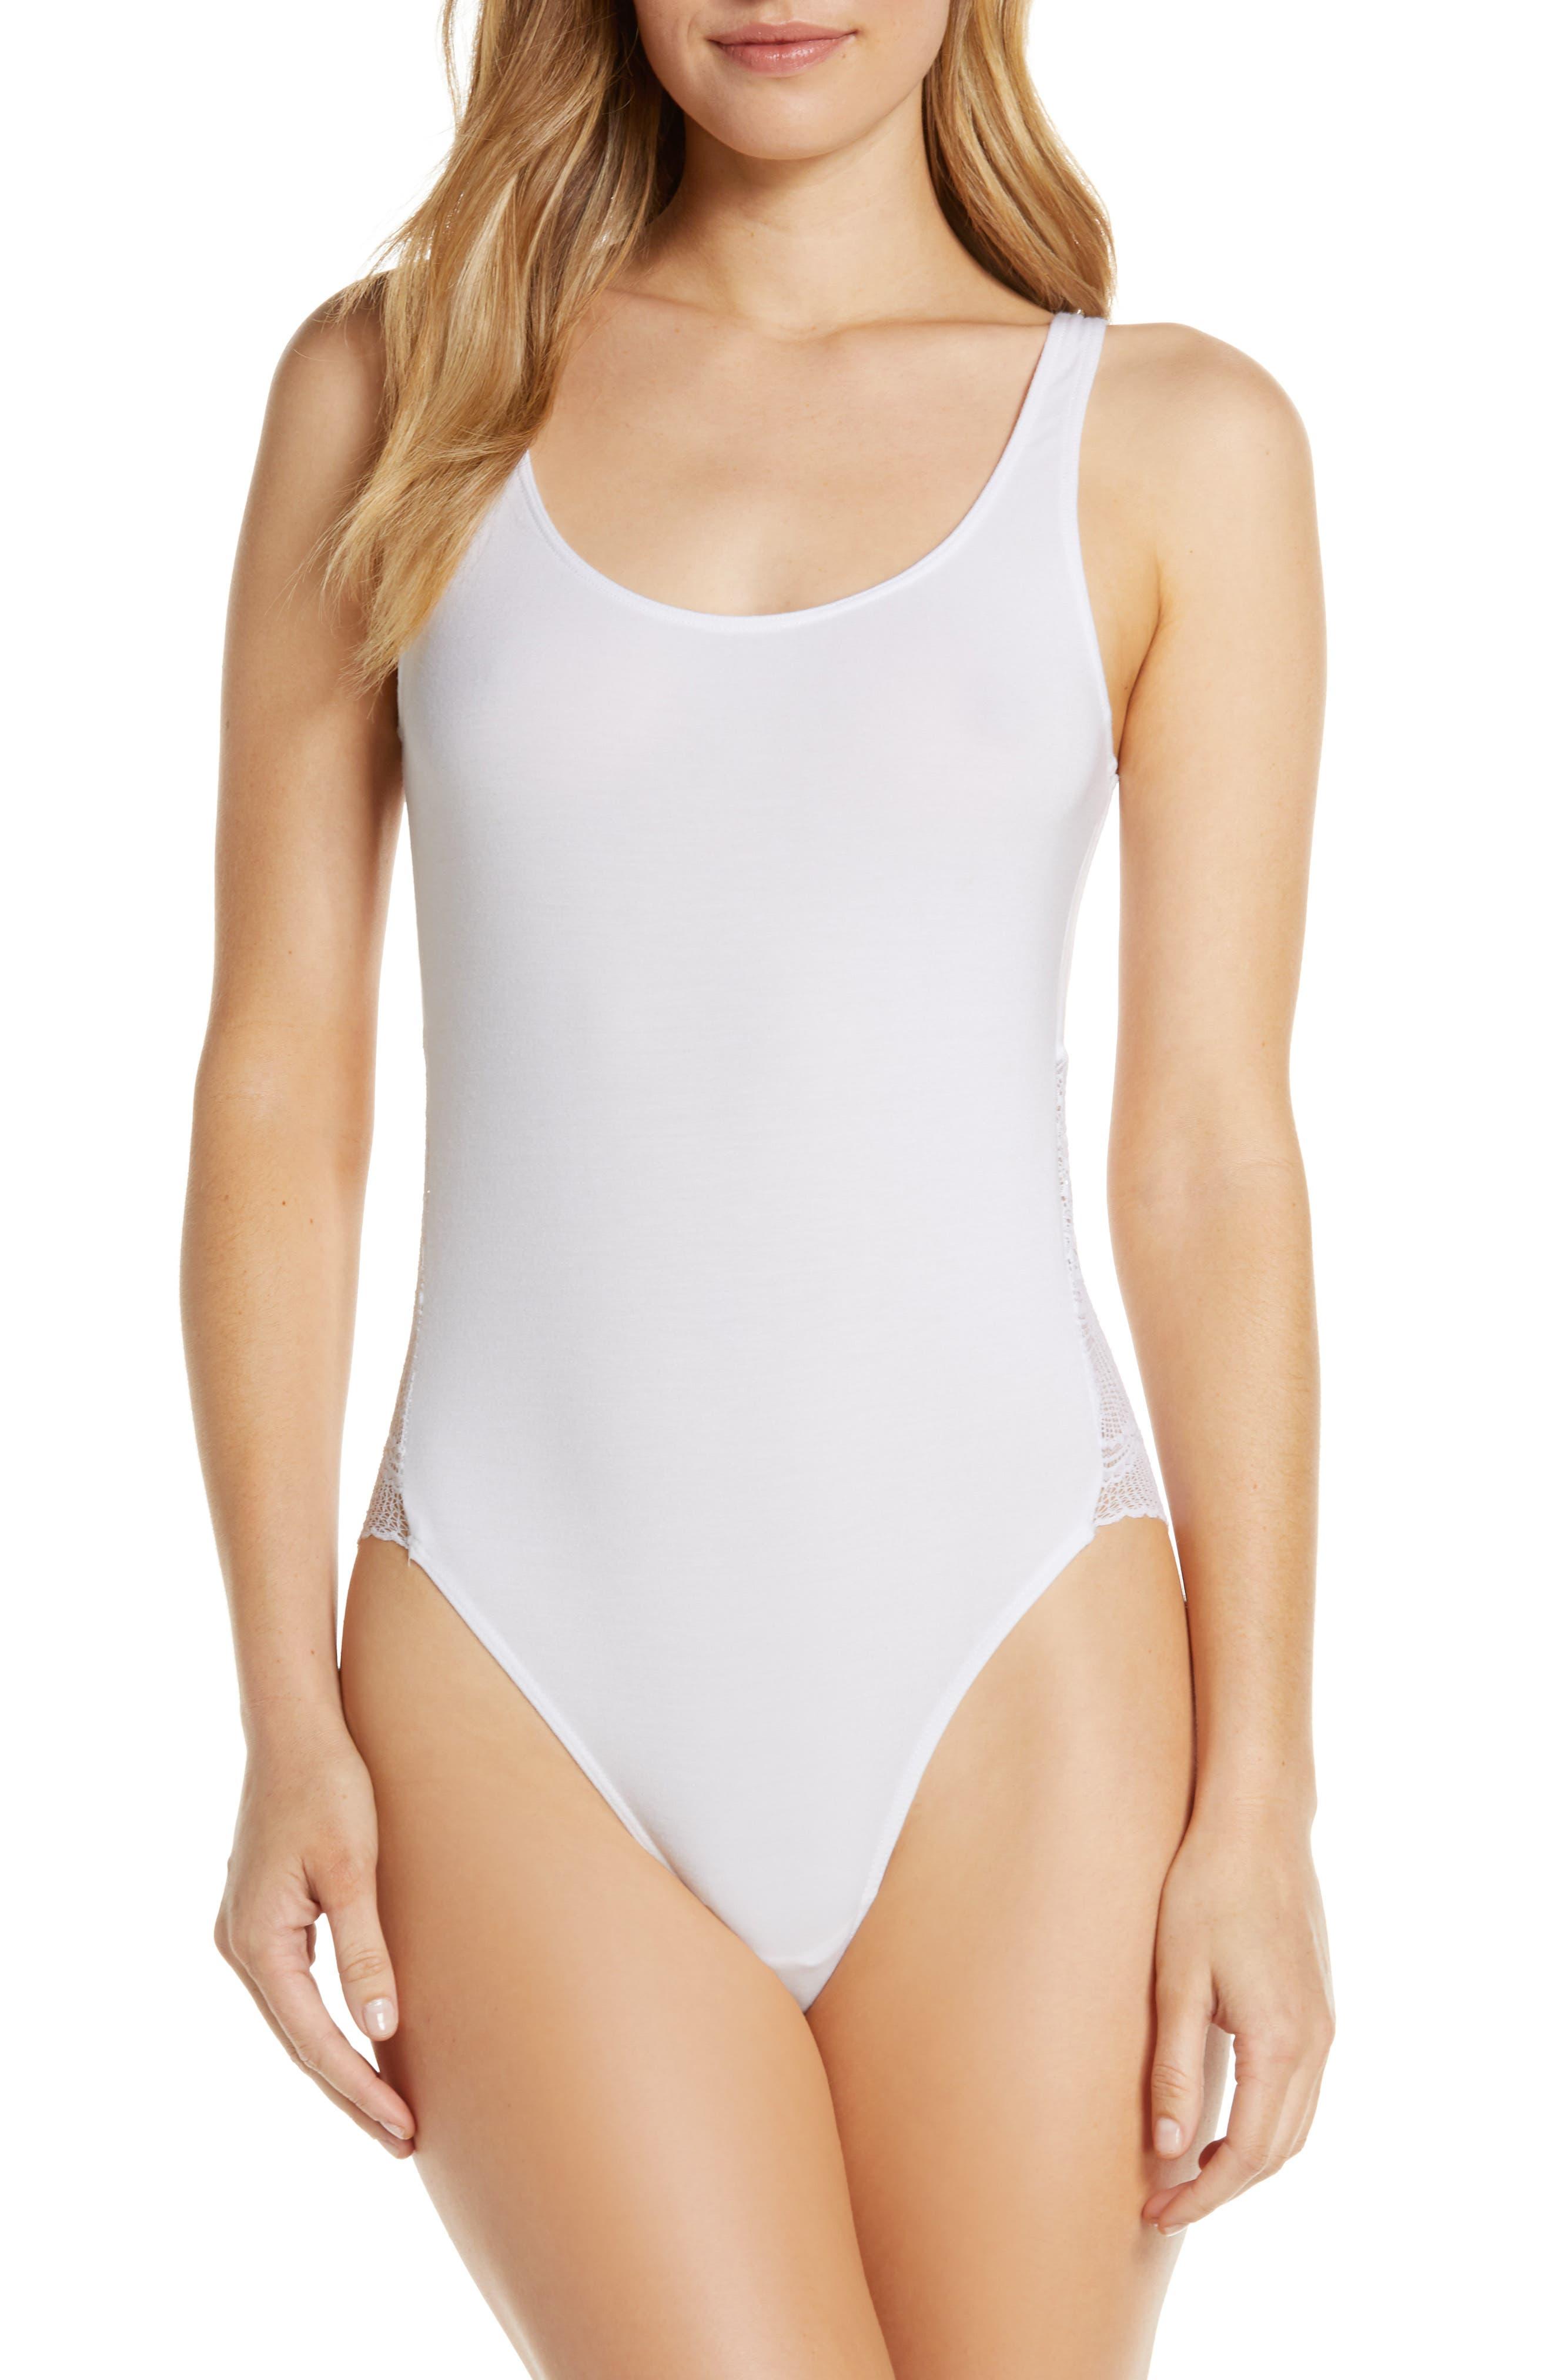 Lace Cutout Thong Bodysuit